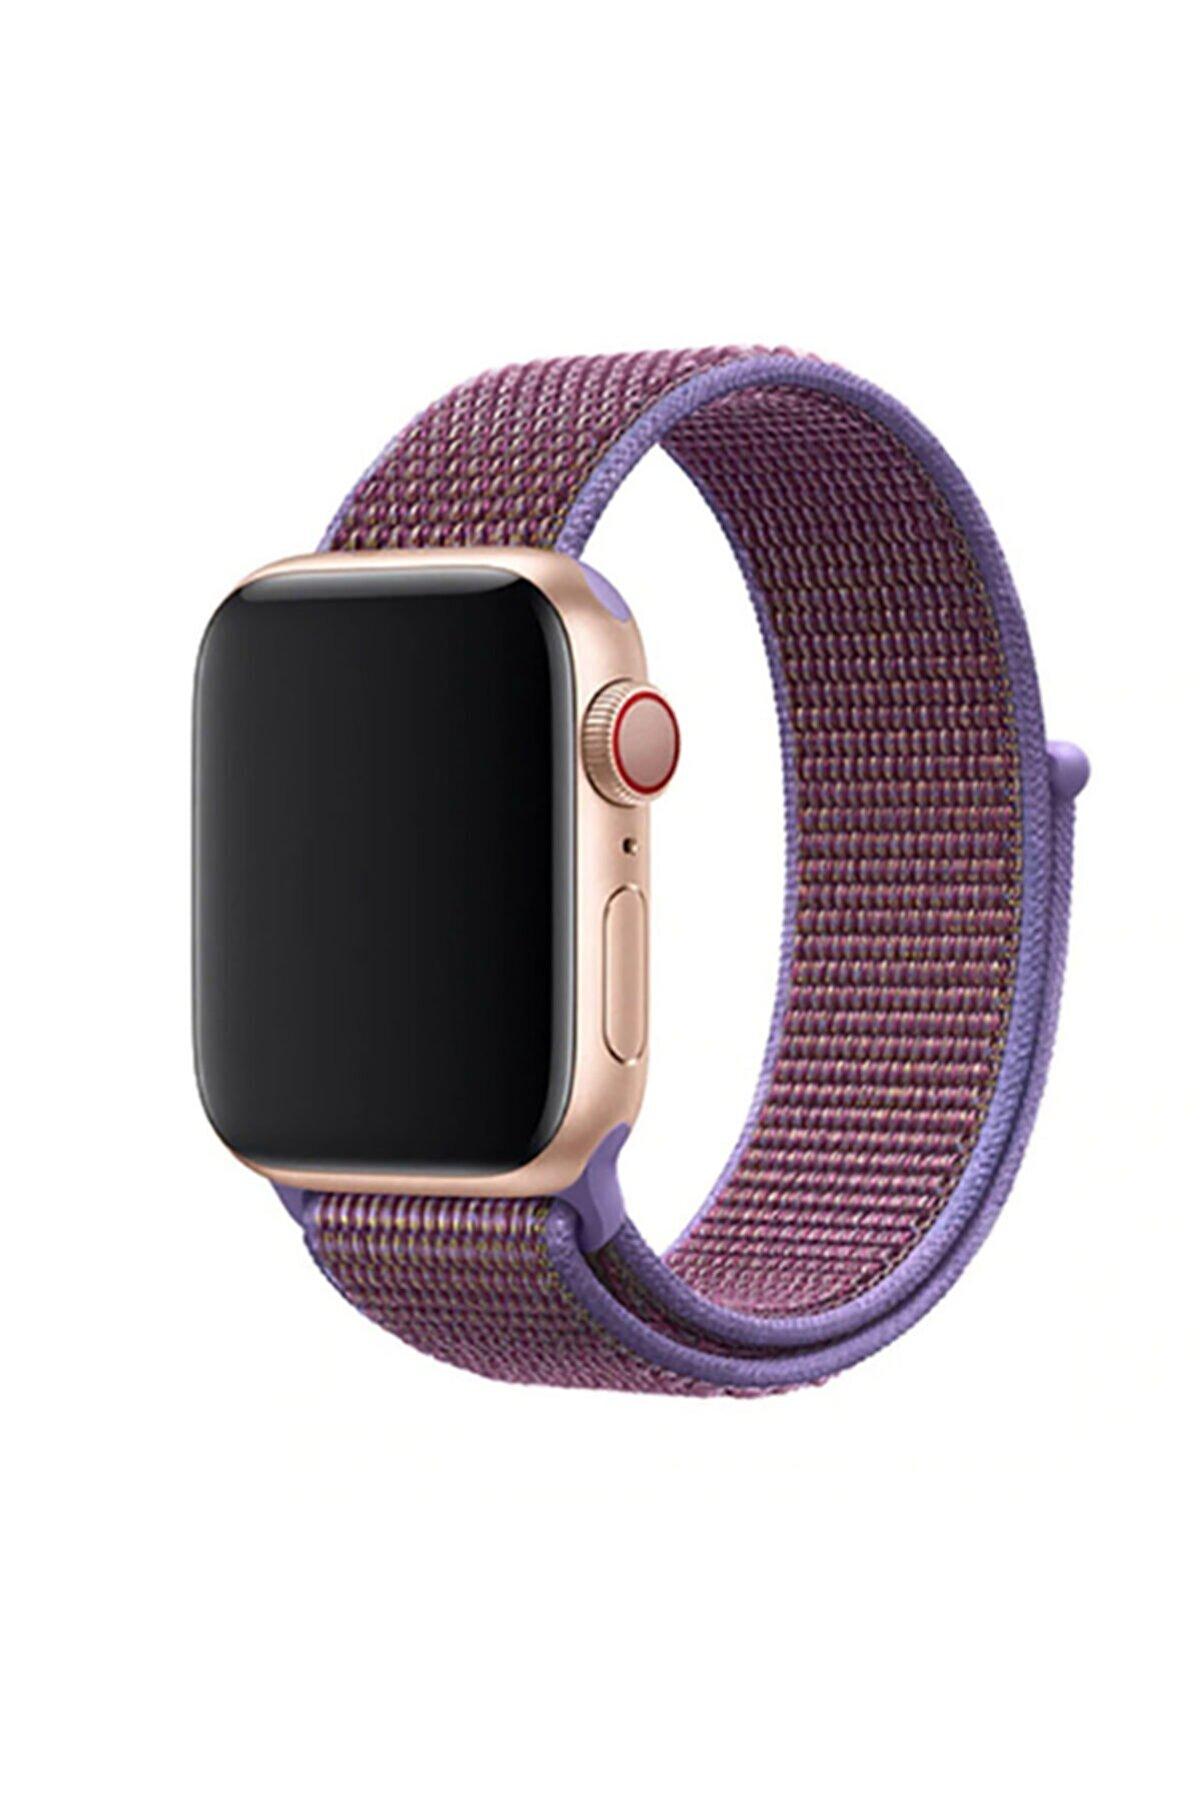 Zore Apple Watch 1 2 3 4 5 Serisi Uyumlu   42mm Kordon Spor Loop Hasır Cırt Cırtlı Kayış